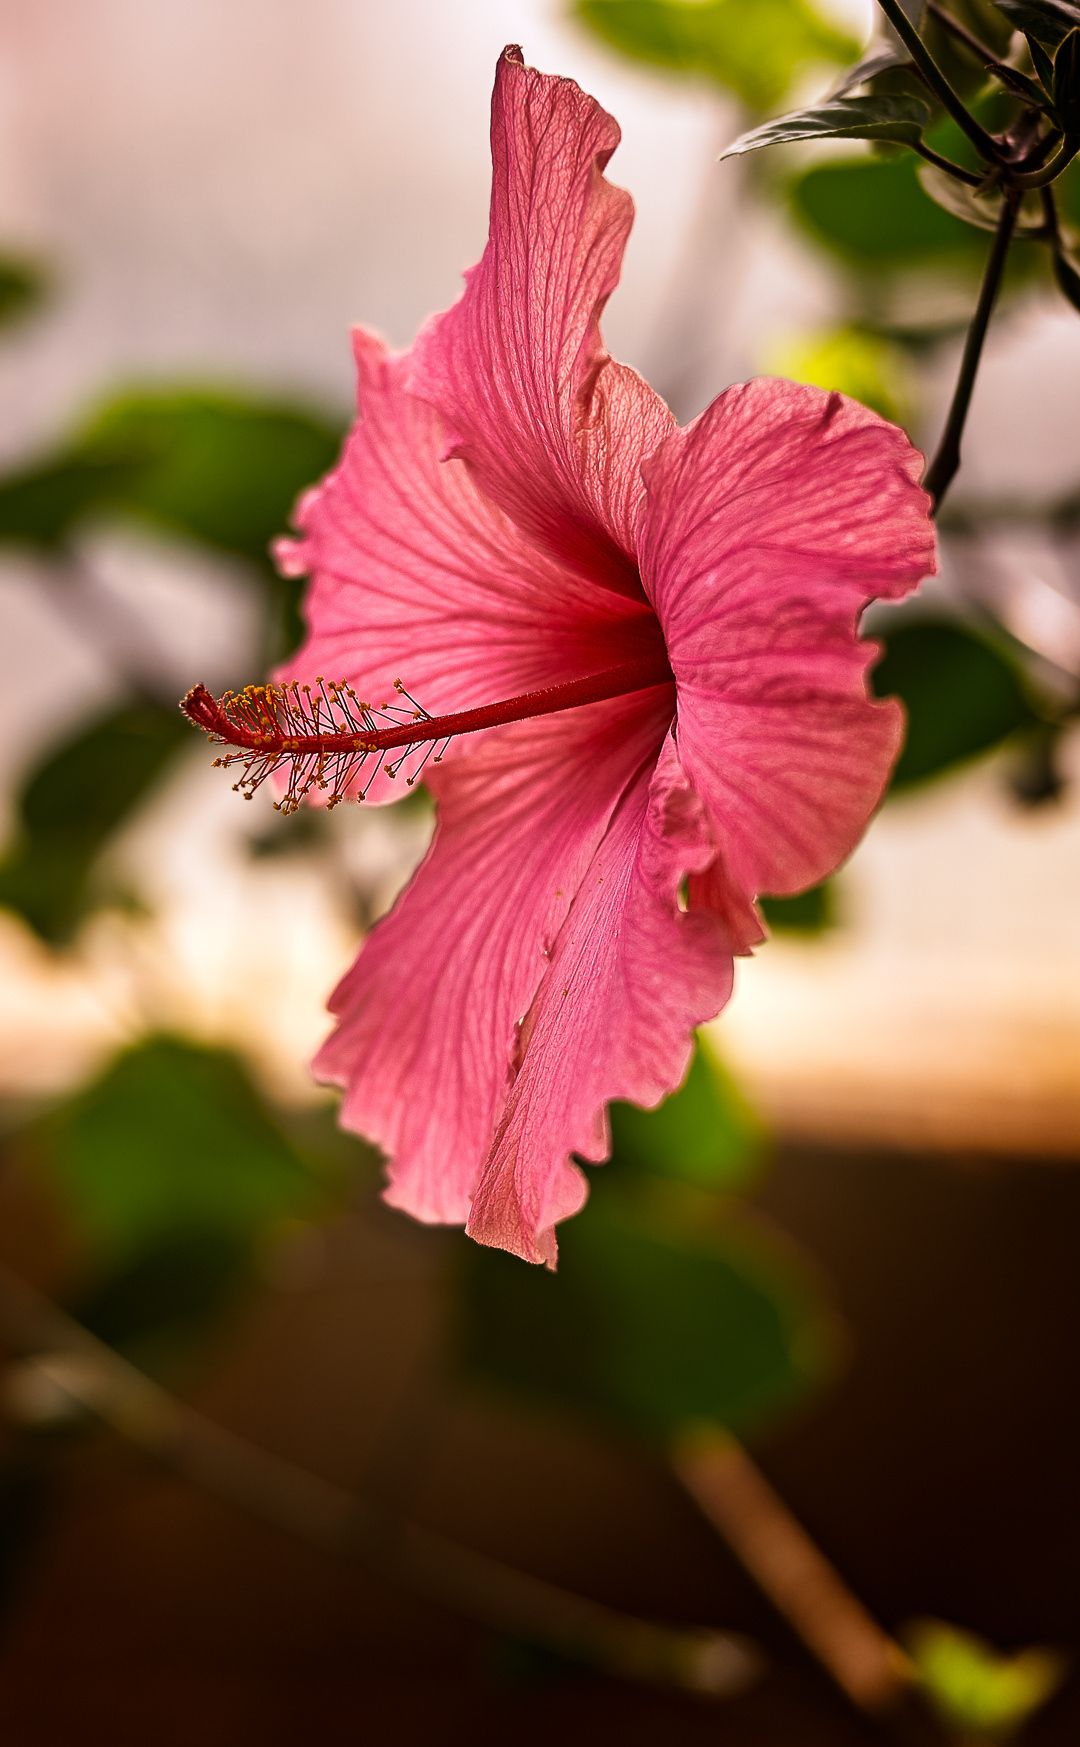 Hibiscus flowers uk images flower wallpaper hd hibiscus hibiscus flower my photos of england pinterest hibiscus hibiscus flower izmirmasajfo izmirmasajfo